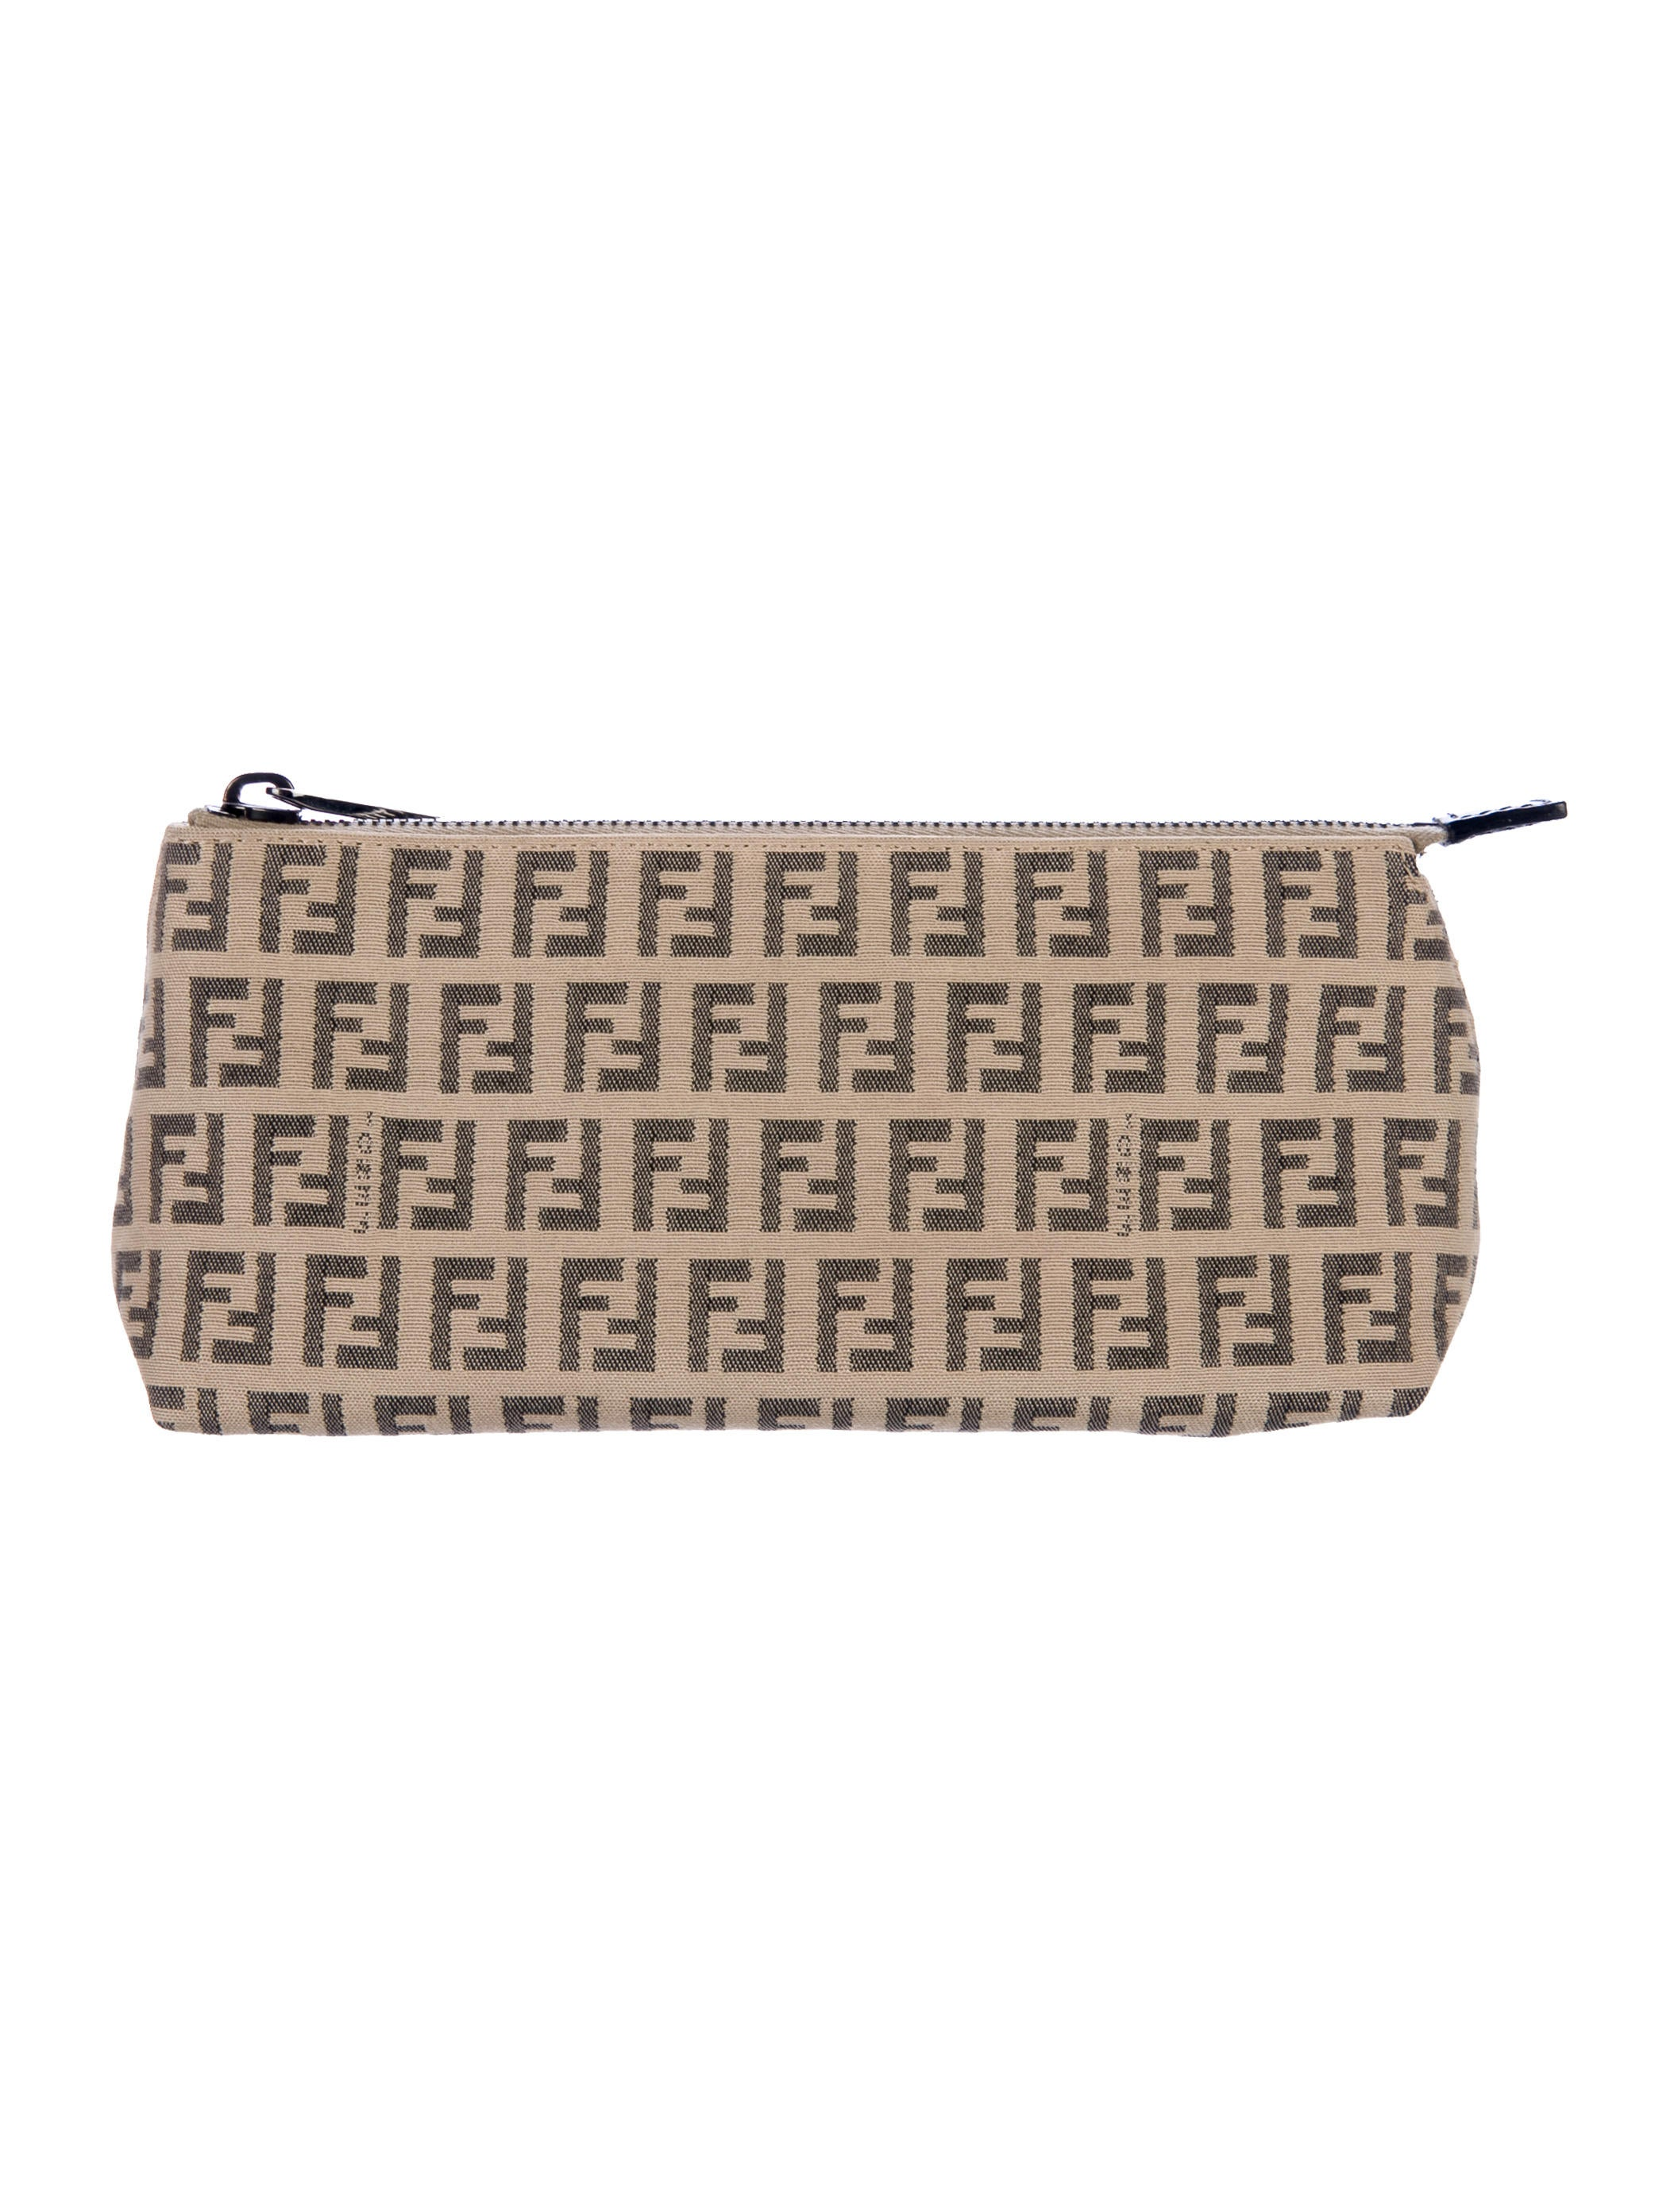 Fendi Zucchino Cosmetic Bag - Accessories - FEN66533  370b5cd4c0e1d